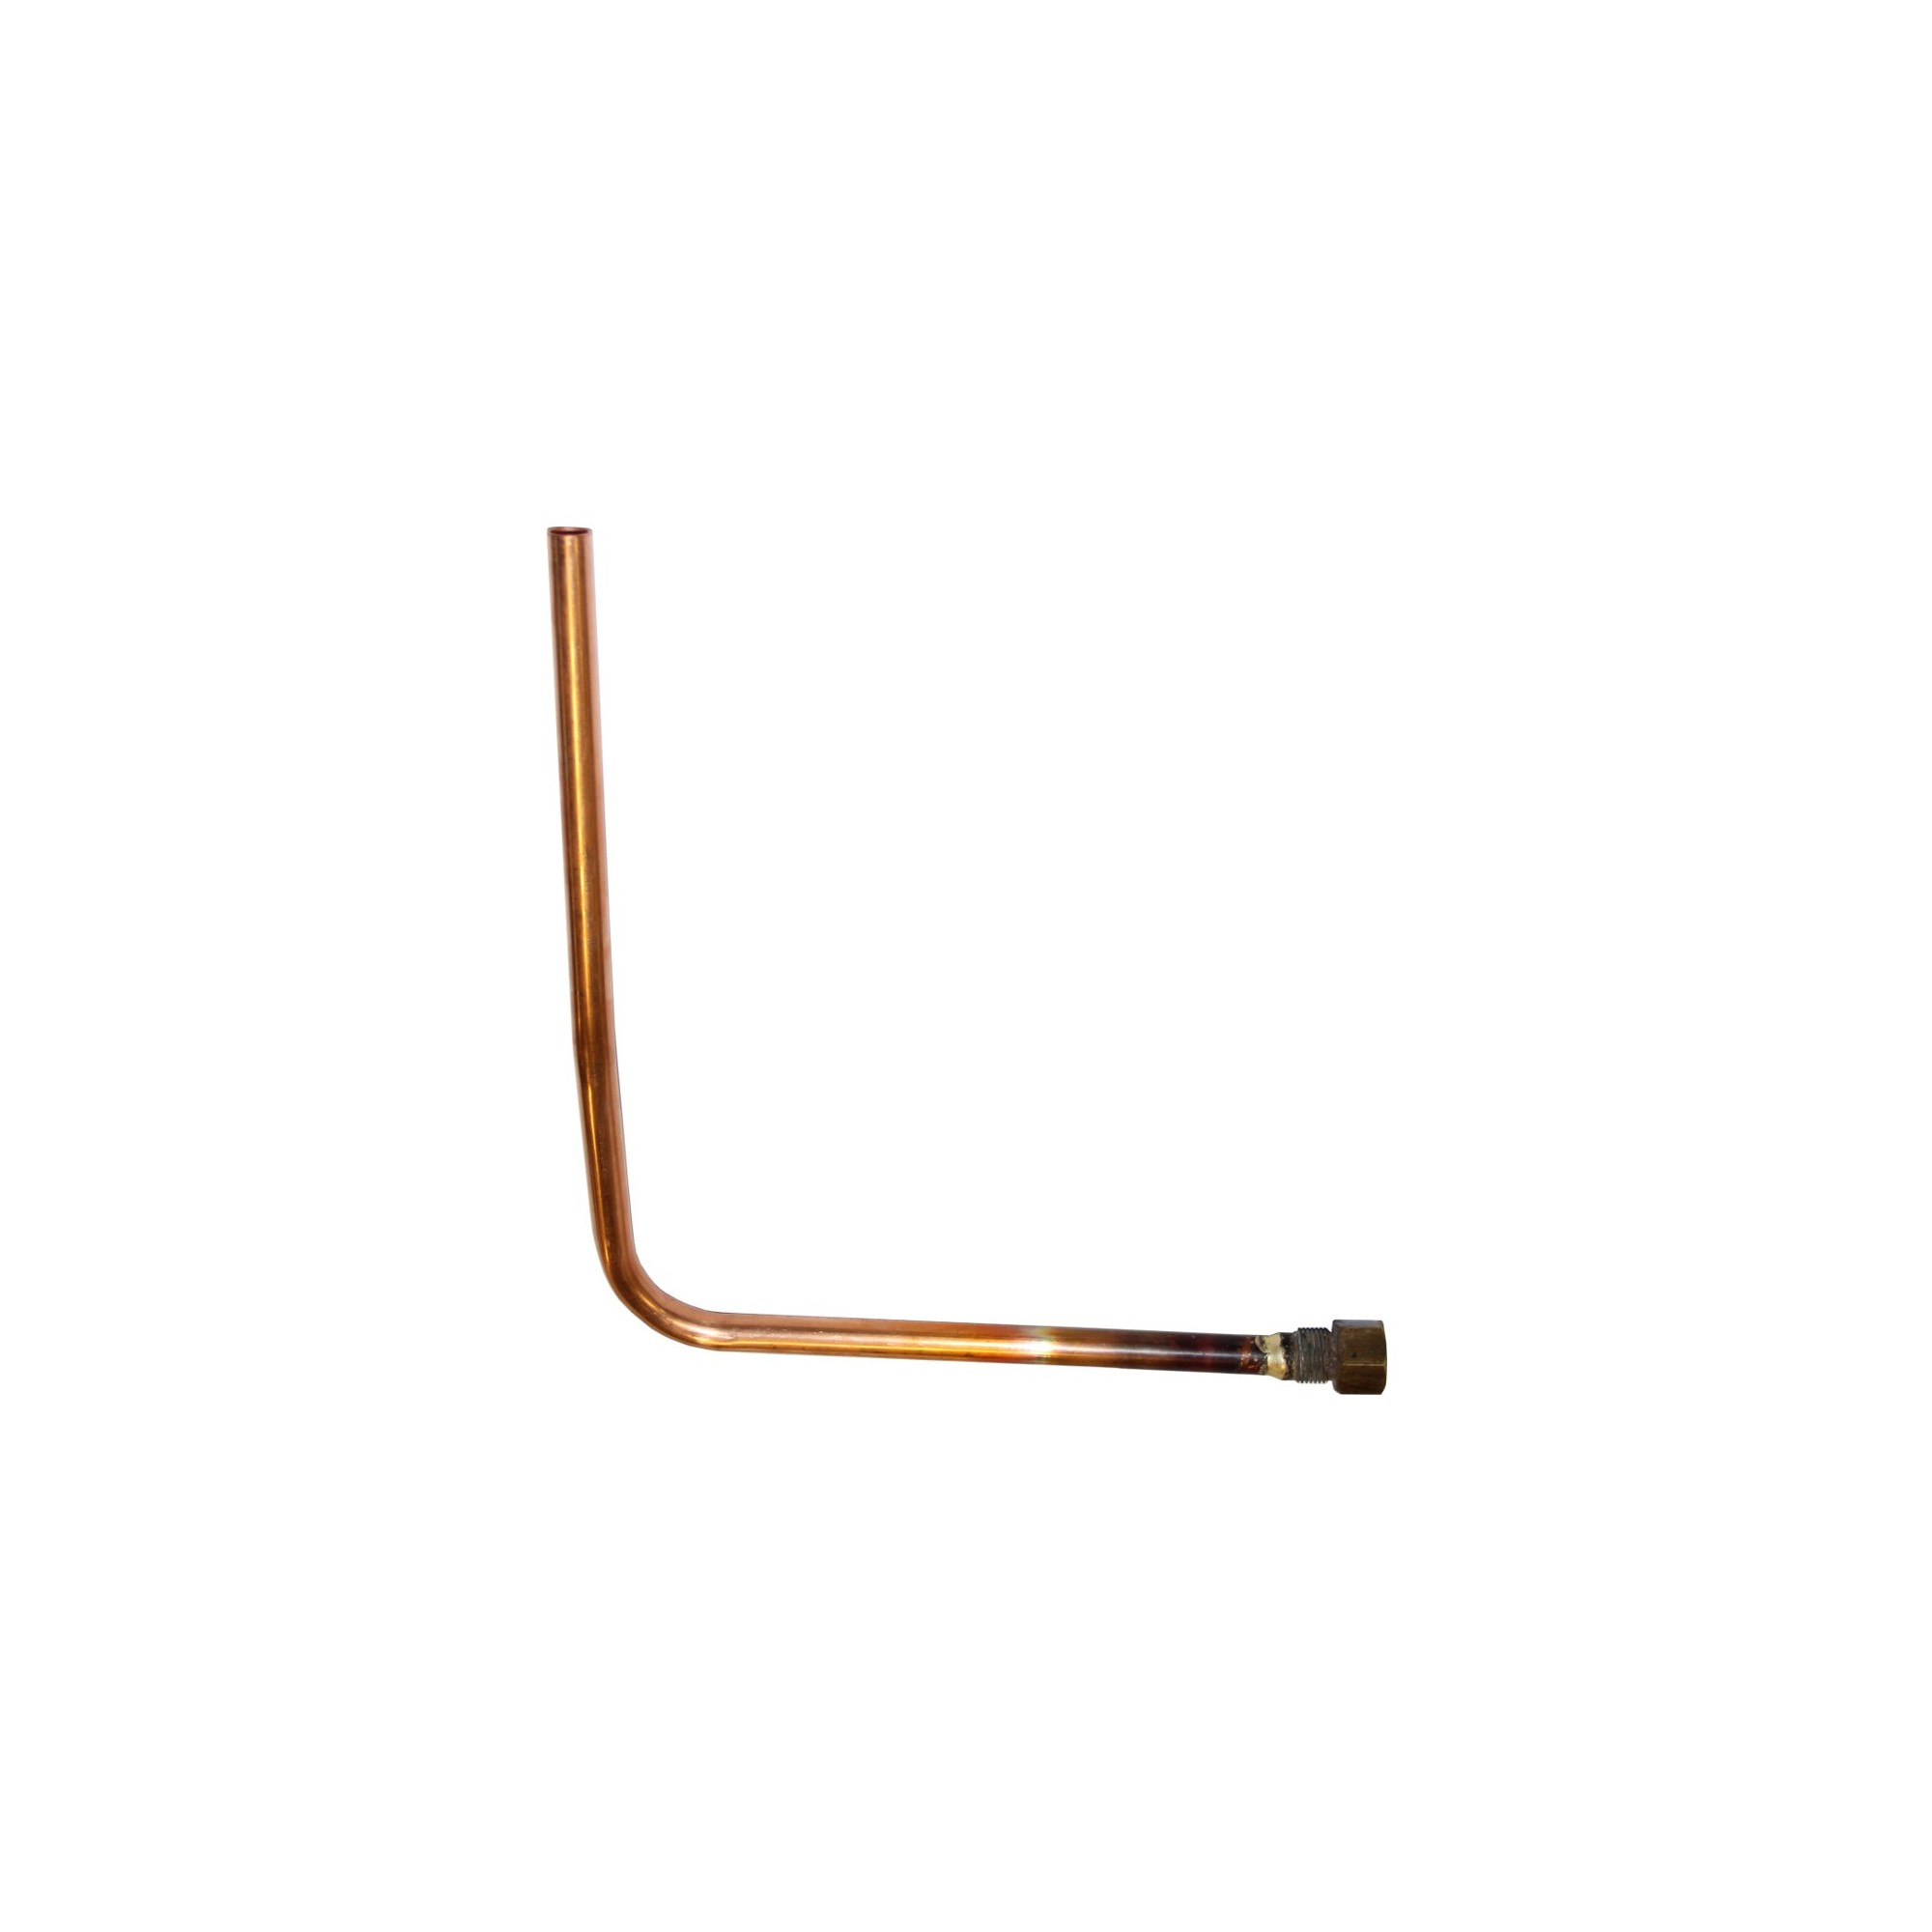 CONDUITE BRÛLEUR Ø12 x 440 mm - A7